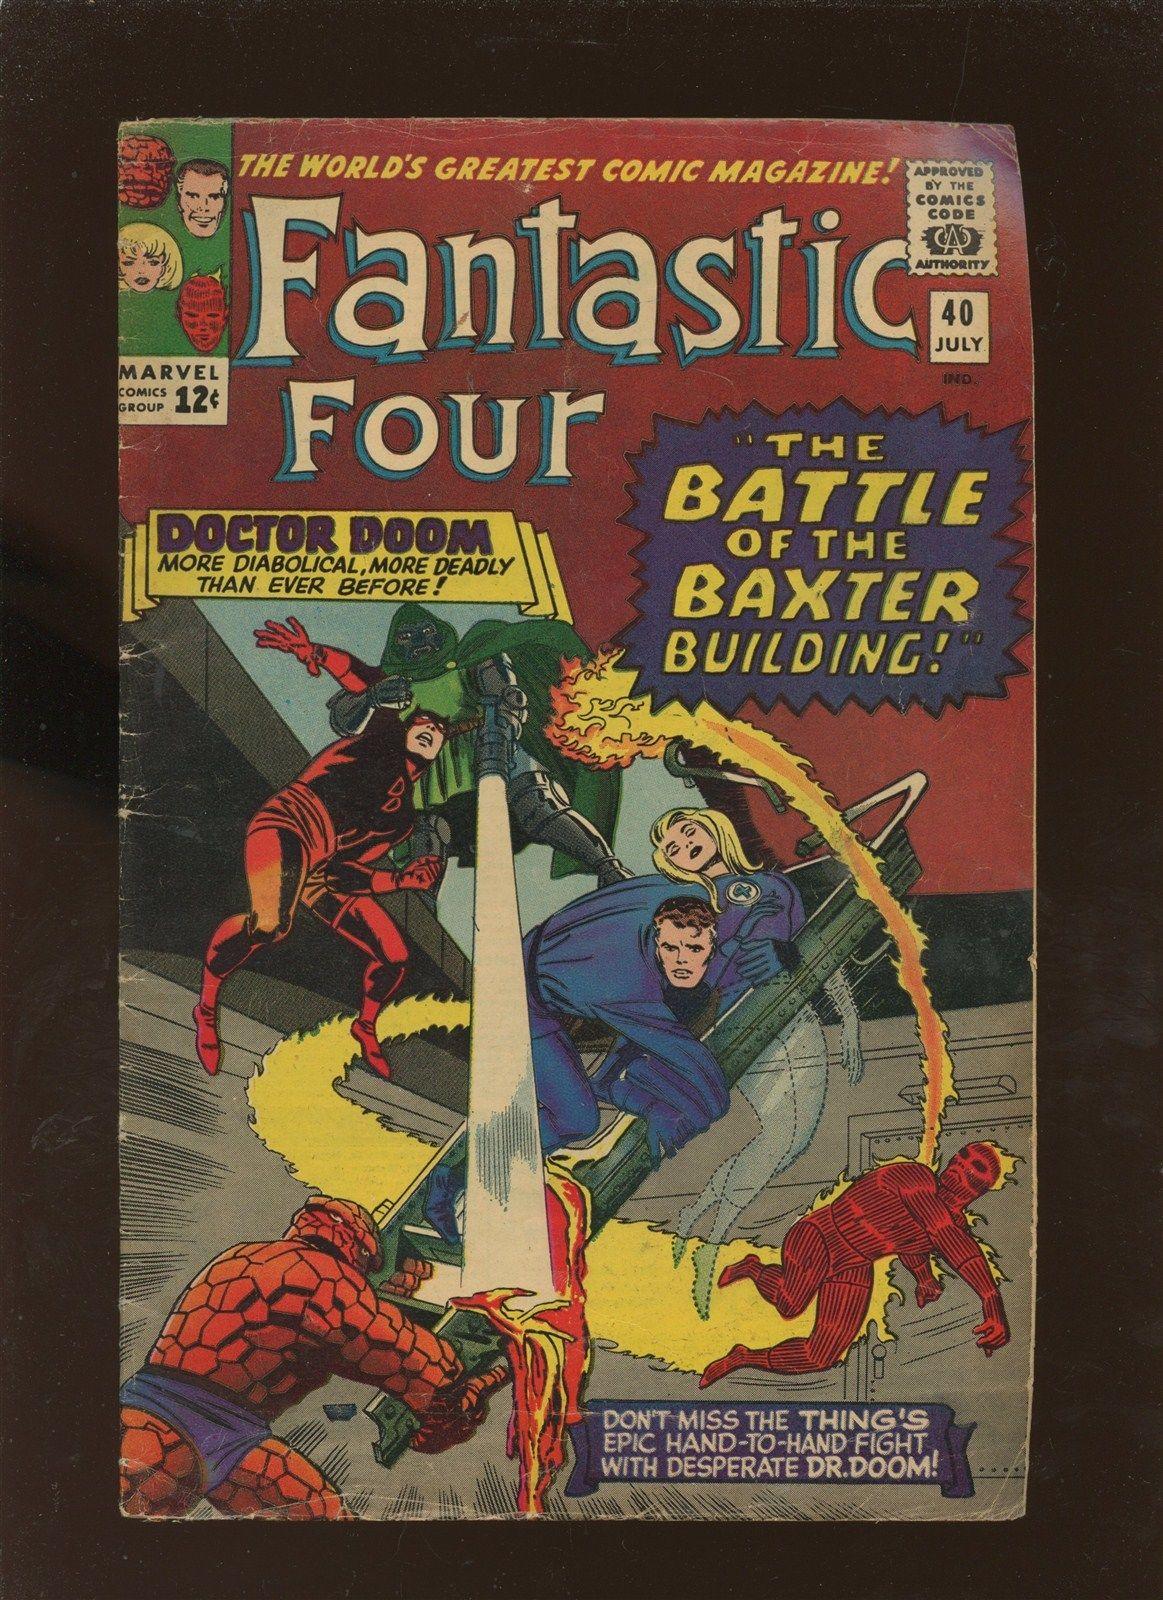 Fantastic Four 40 VG 4.0 * 1 Book Lot * Dr Doom & Thing Reborn